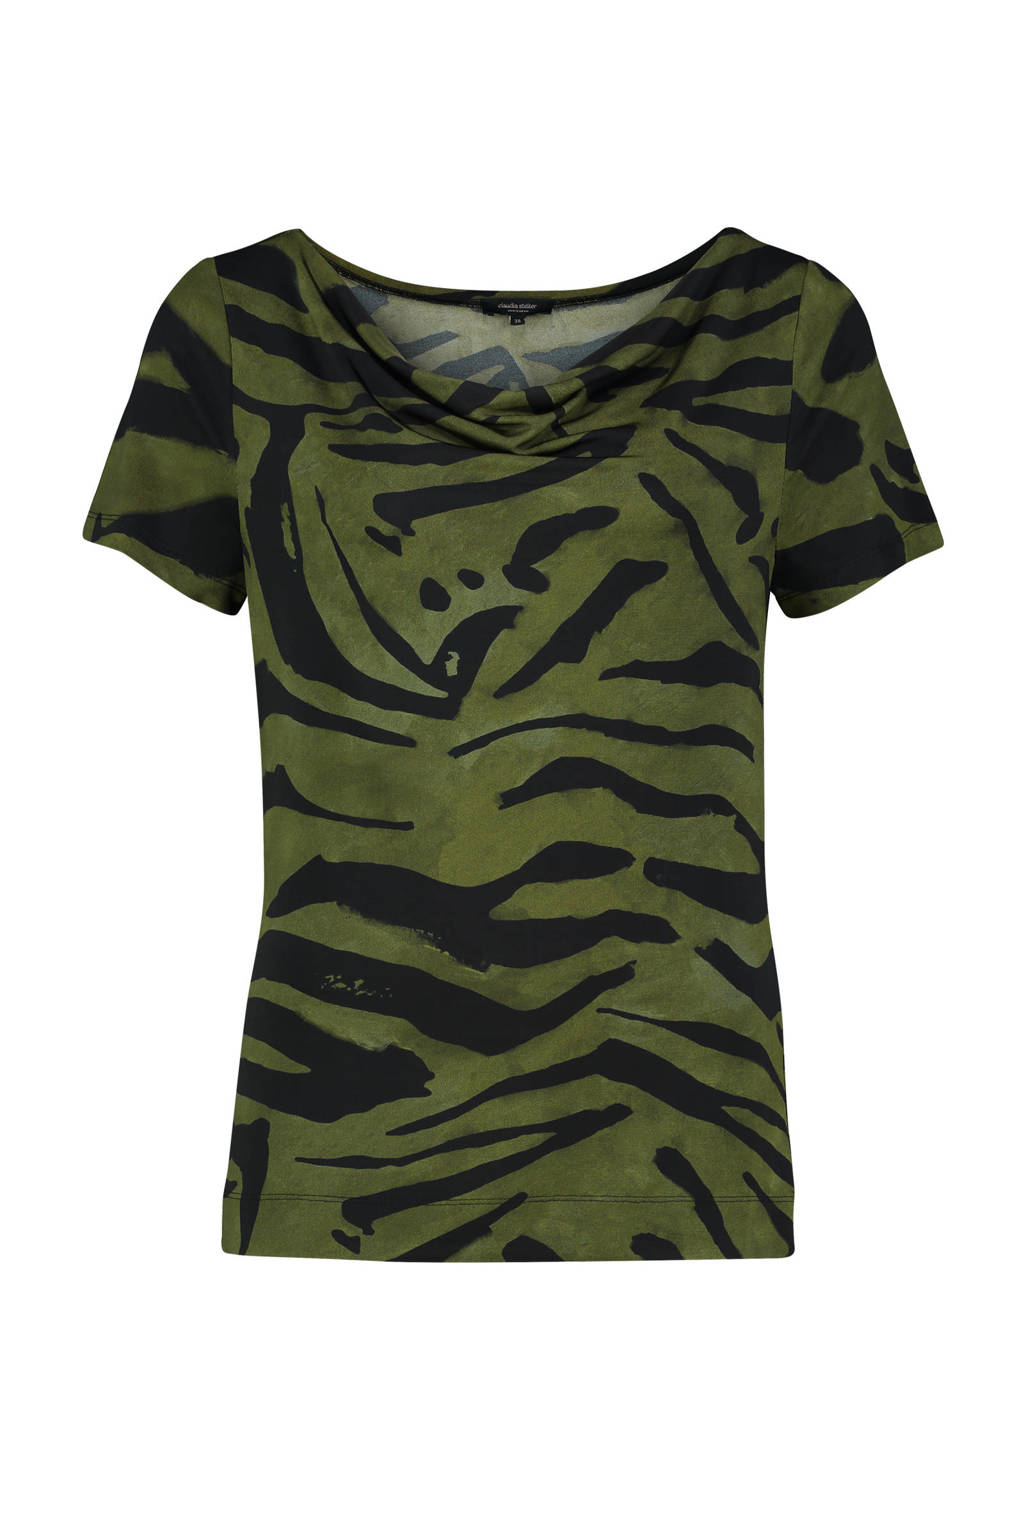 Claudia Sträter T-shirt met zebraprint groen, Groen